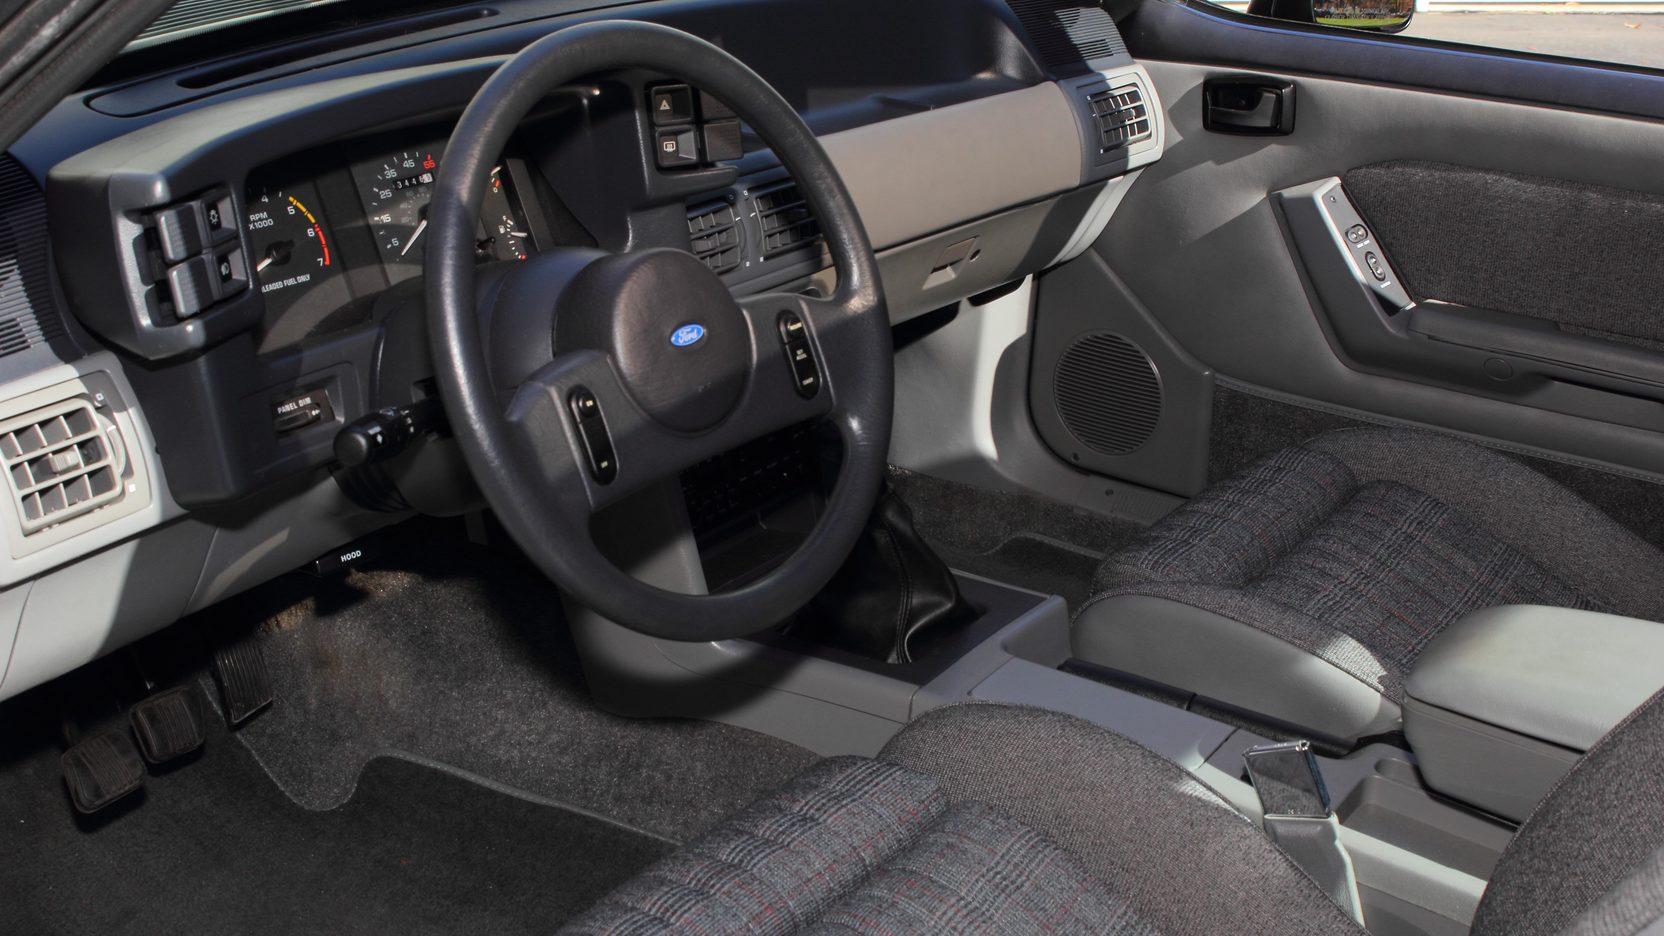 1988 Ford Mustang GT interior